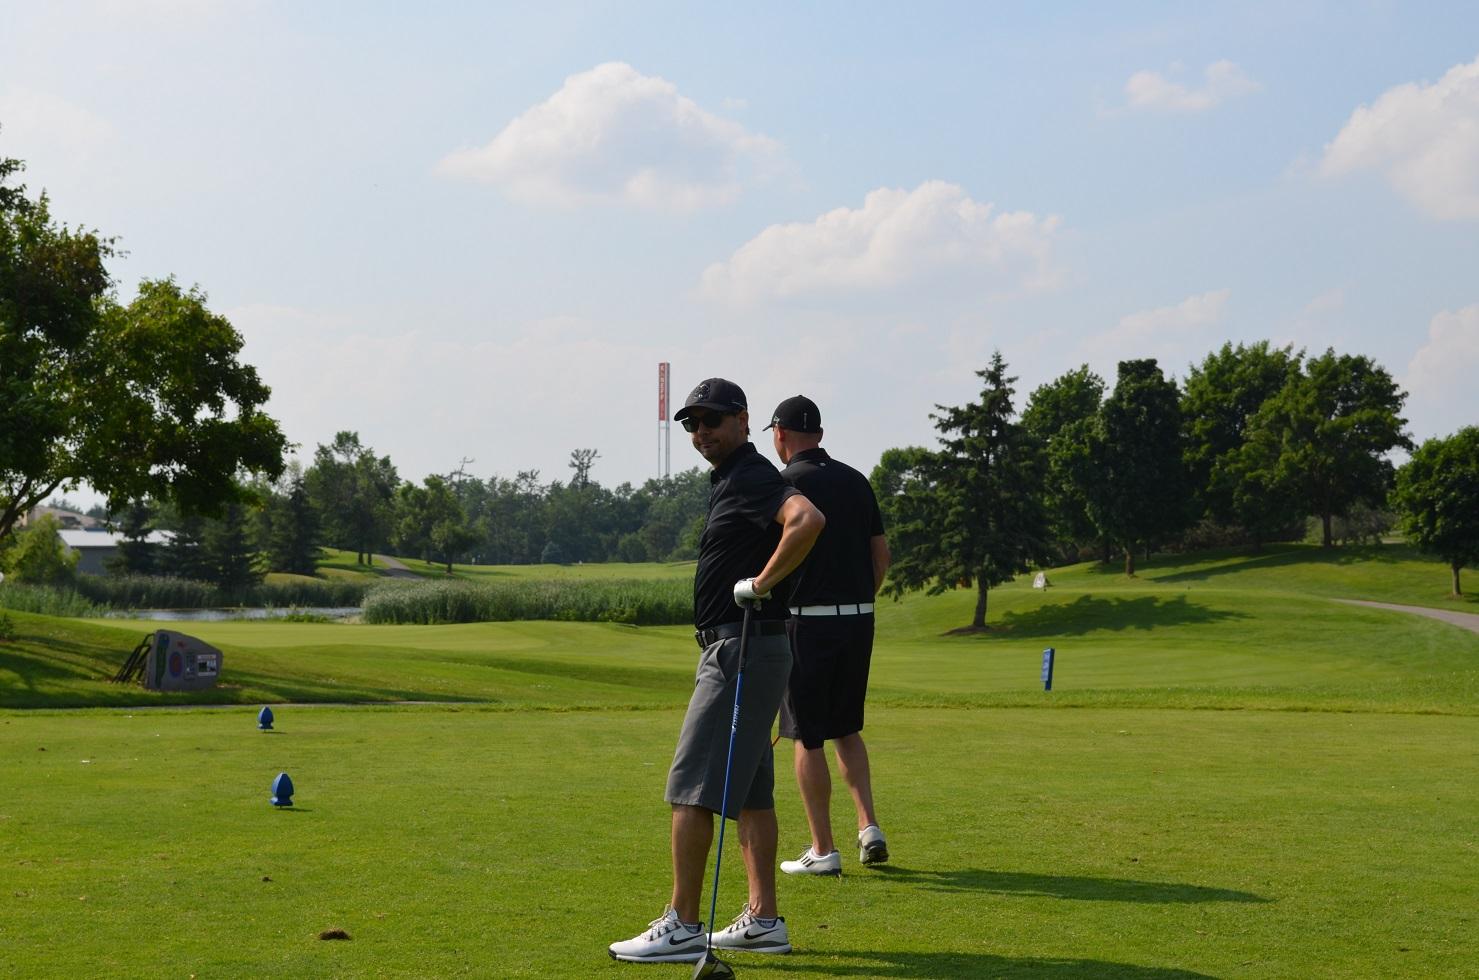 EddieO's Golf guests sexy 15.jpg